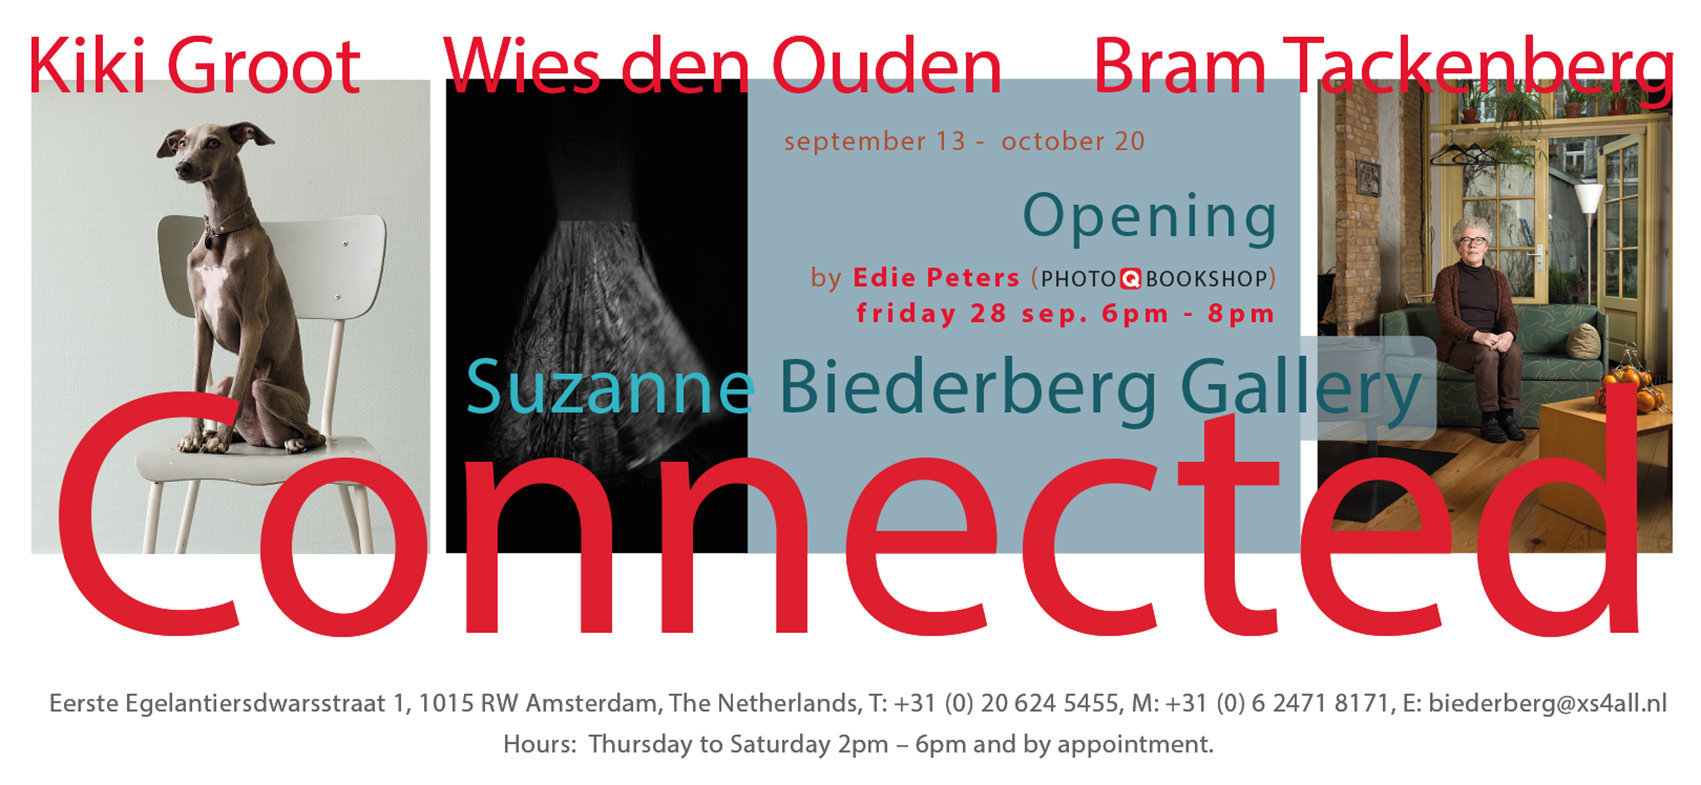 uitnodiging Suzanne Biederberg Gallery English.jpg